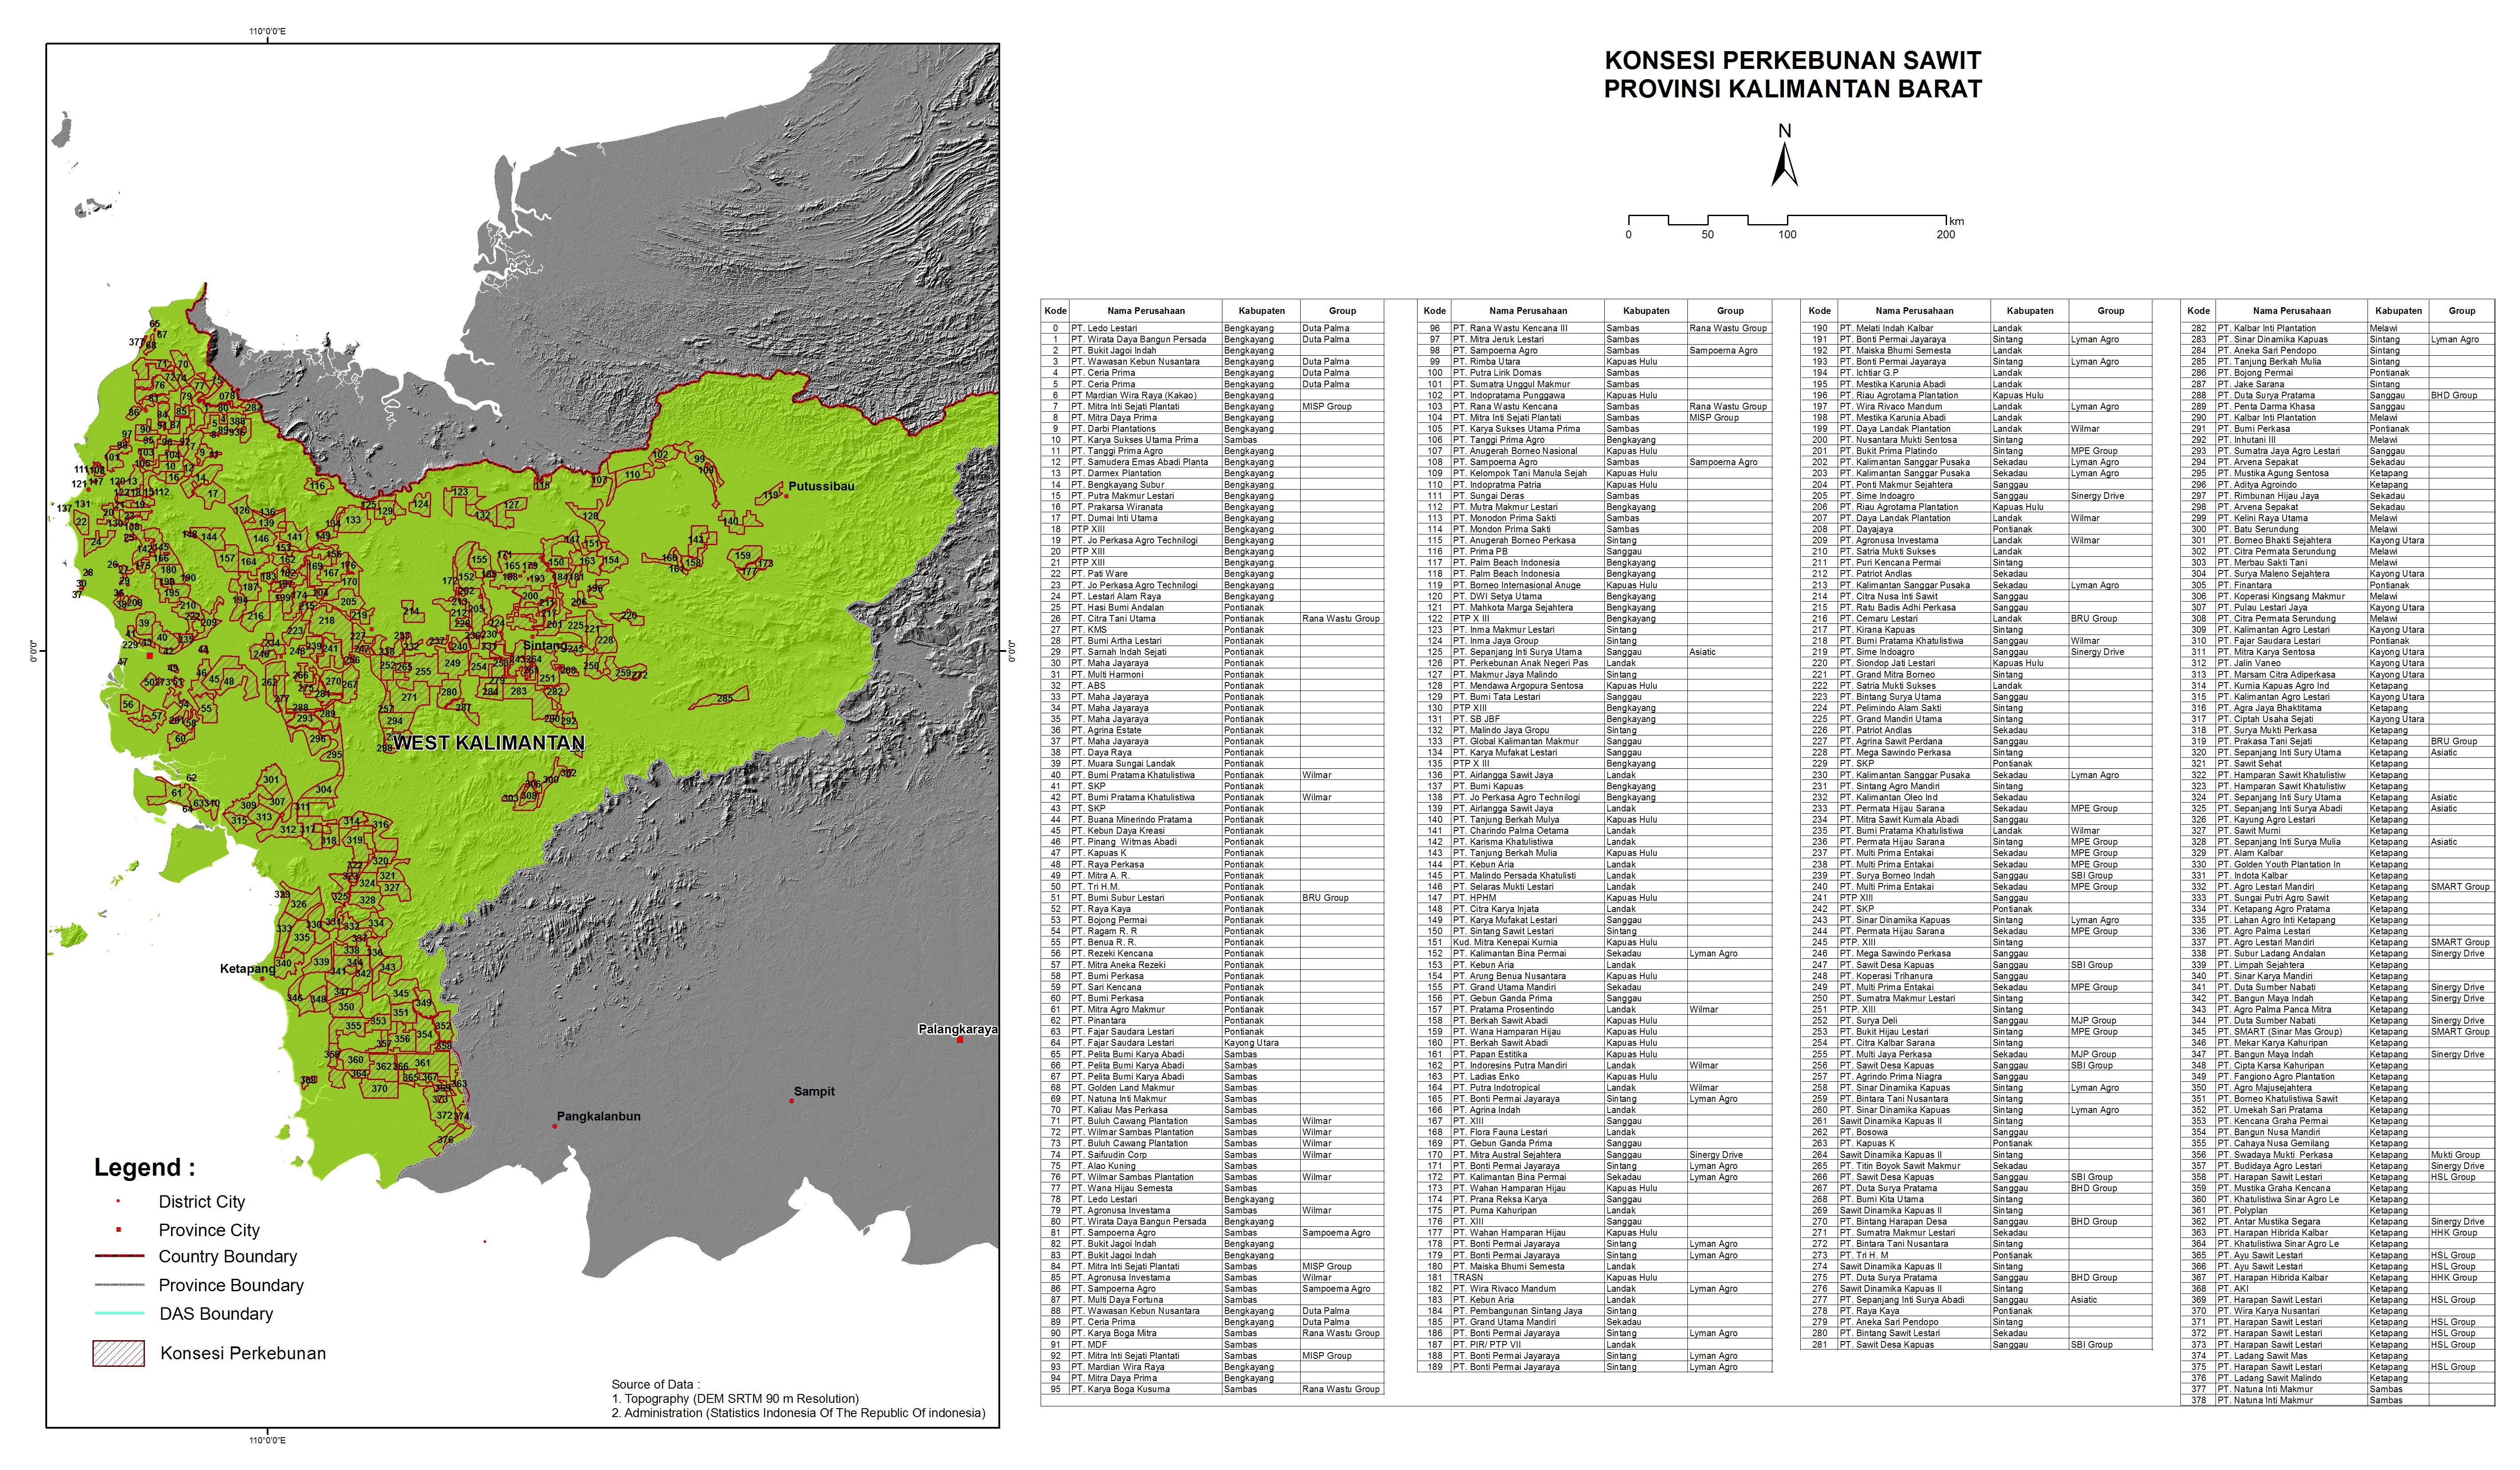 Peta Konsesi Perkebunan Sawit | WWF Indonesia